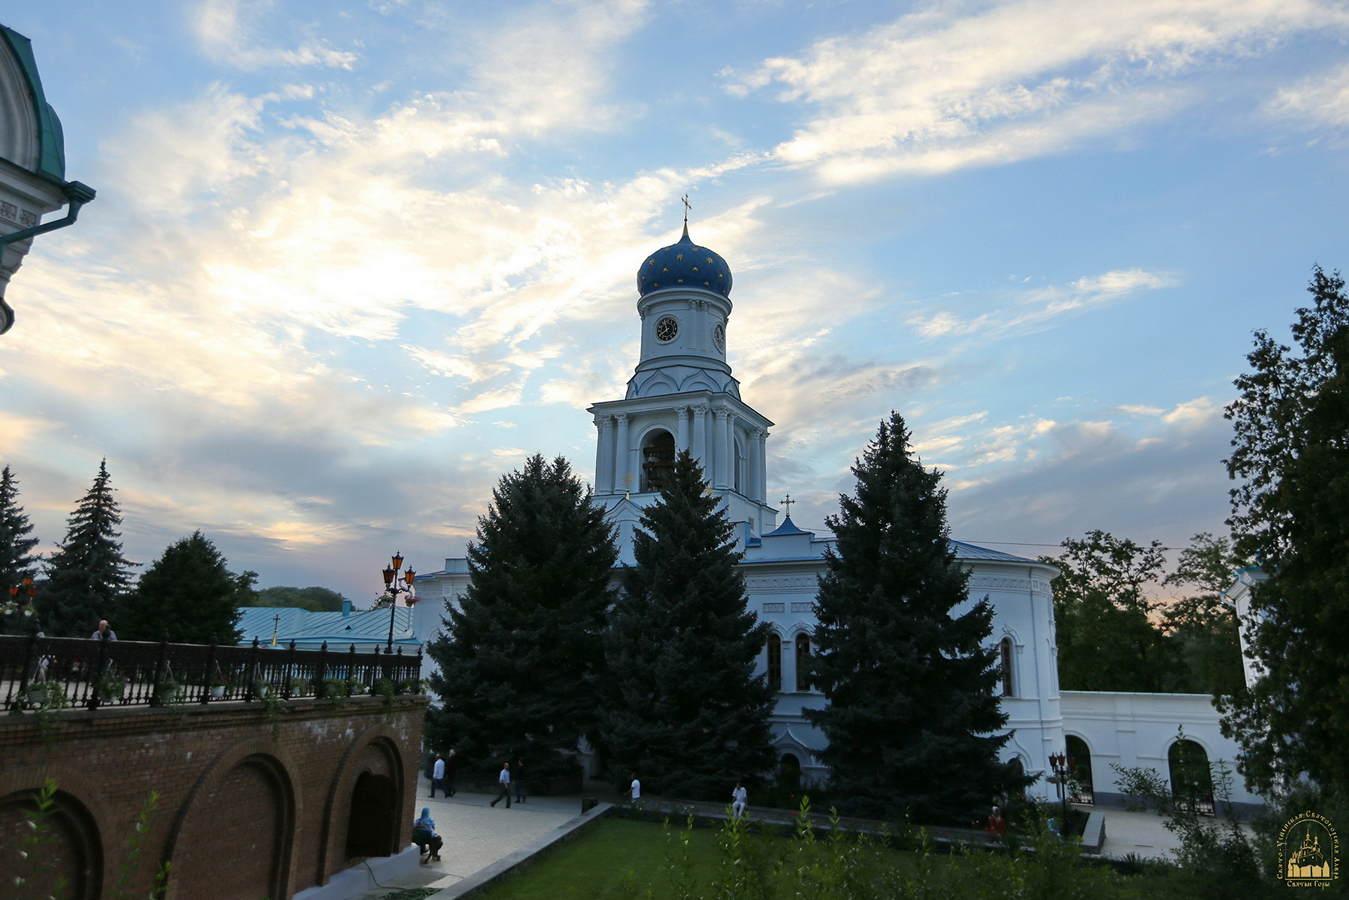 sviatogorskaia_29-30_july_04